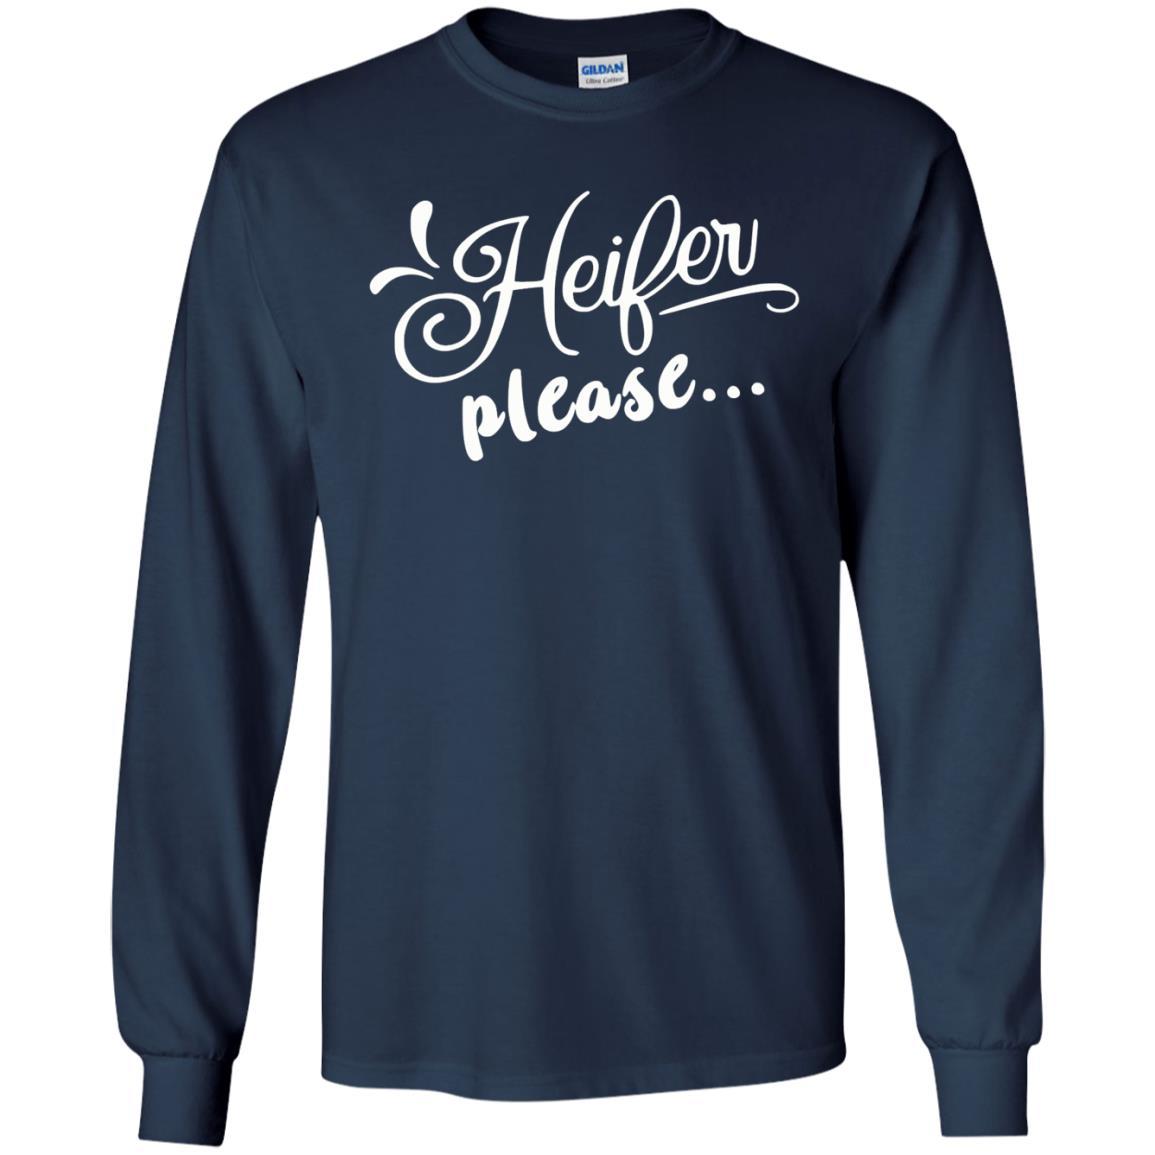 image 2147 - Heifer Please shirt, sweater: funny farmer apparel